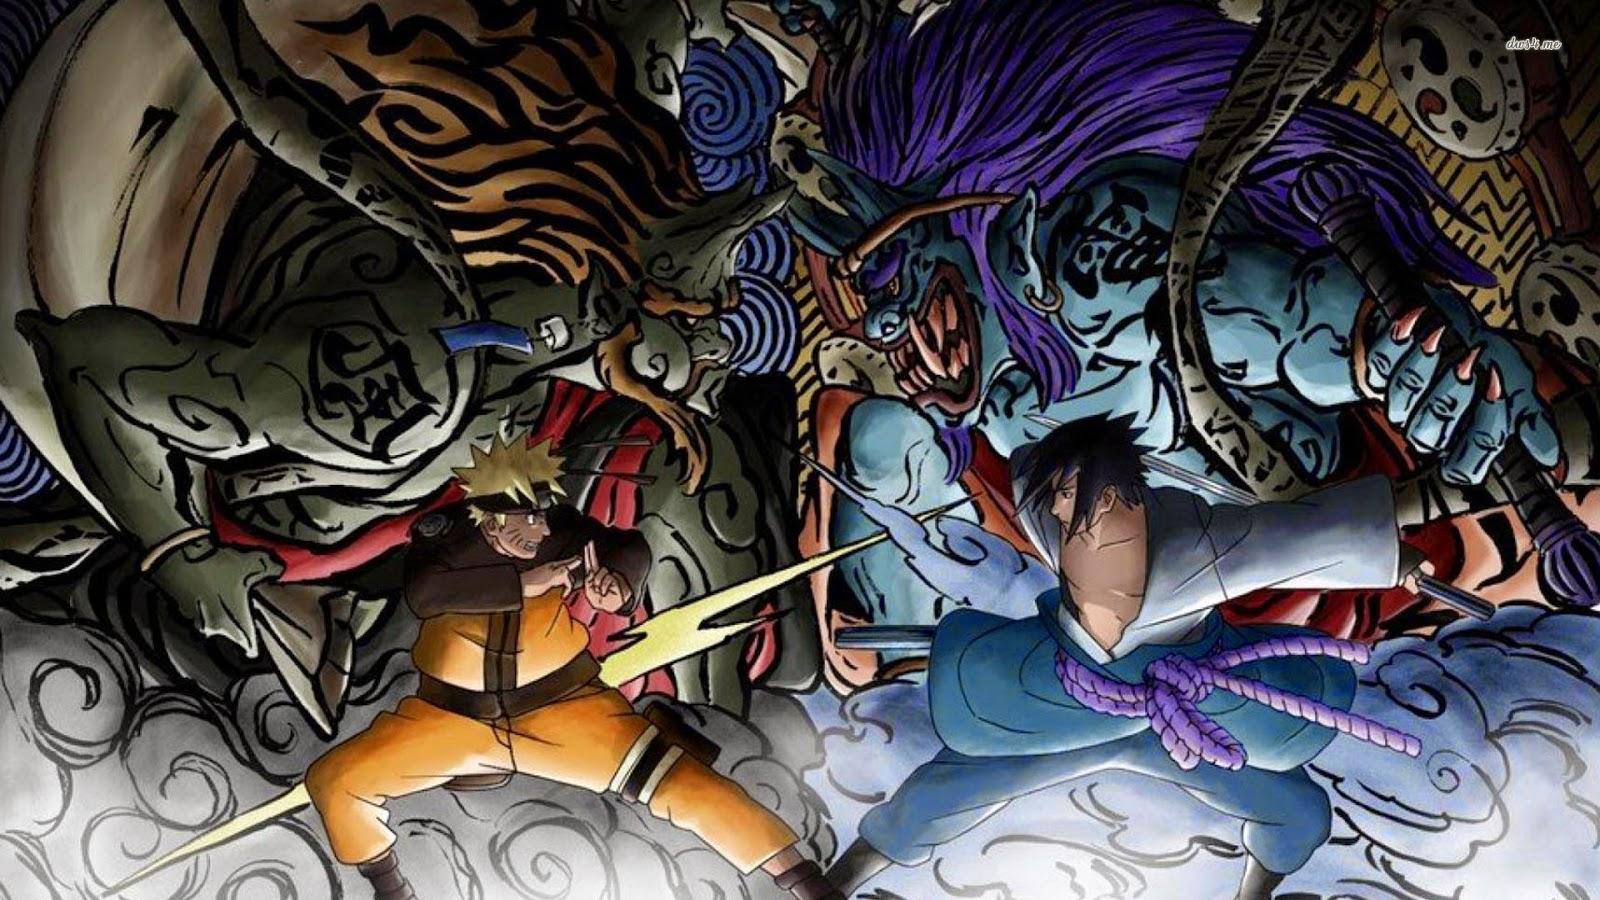 Cool Wallpaper Naruto Art - 19867-naruto-shippuden-1920x1080-anime-wallpaper  Pictures_518186.jpg